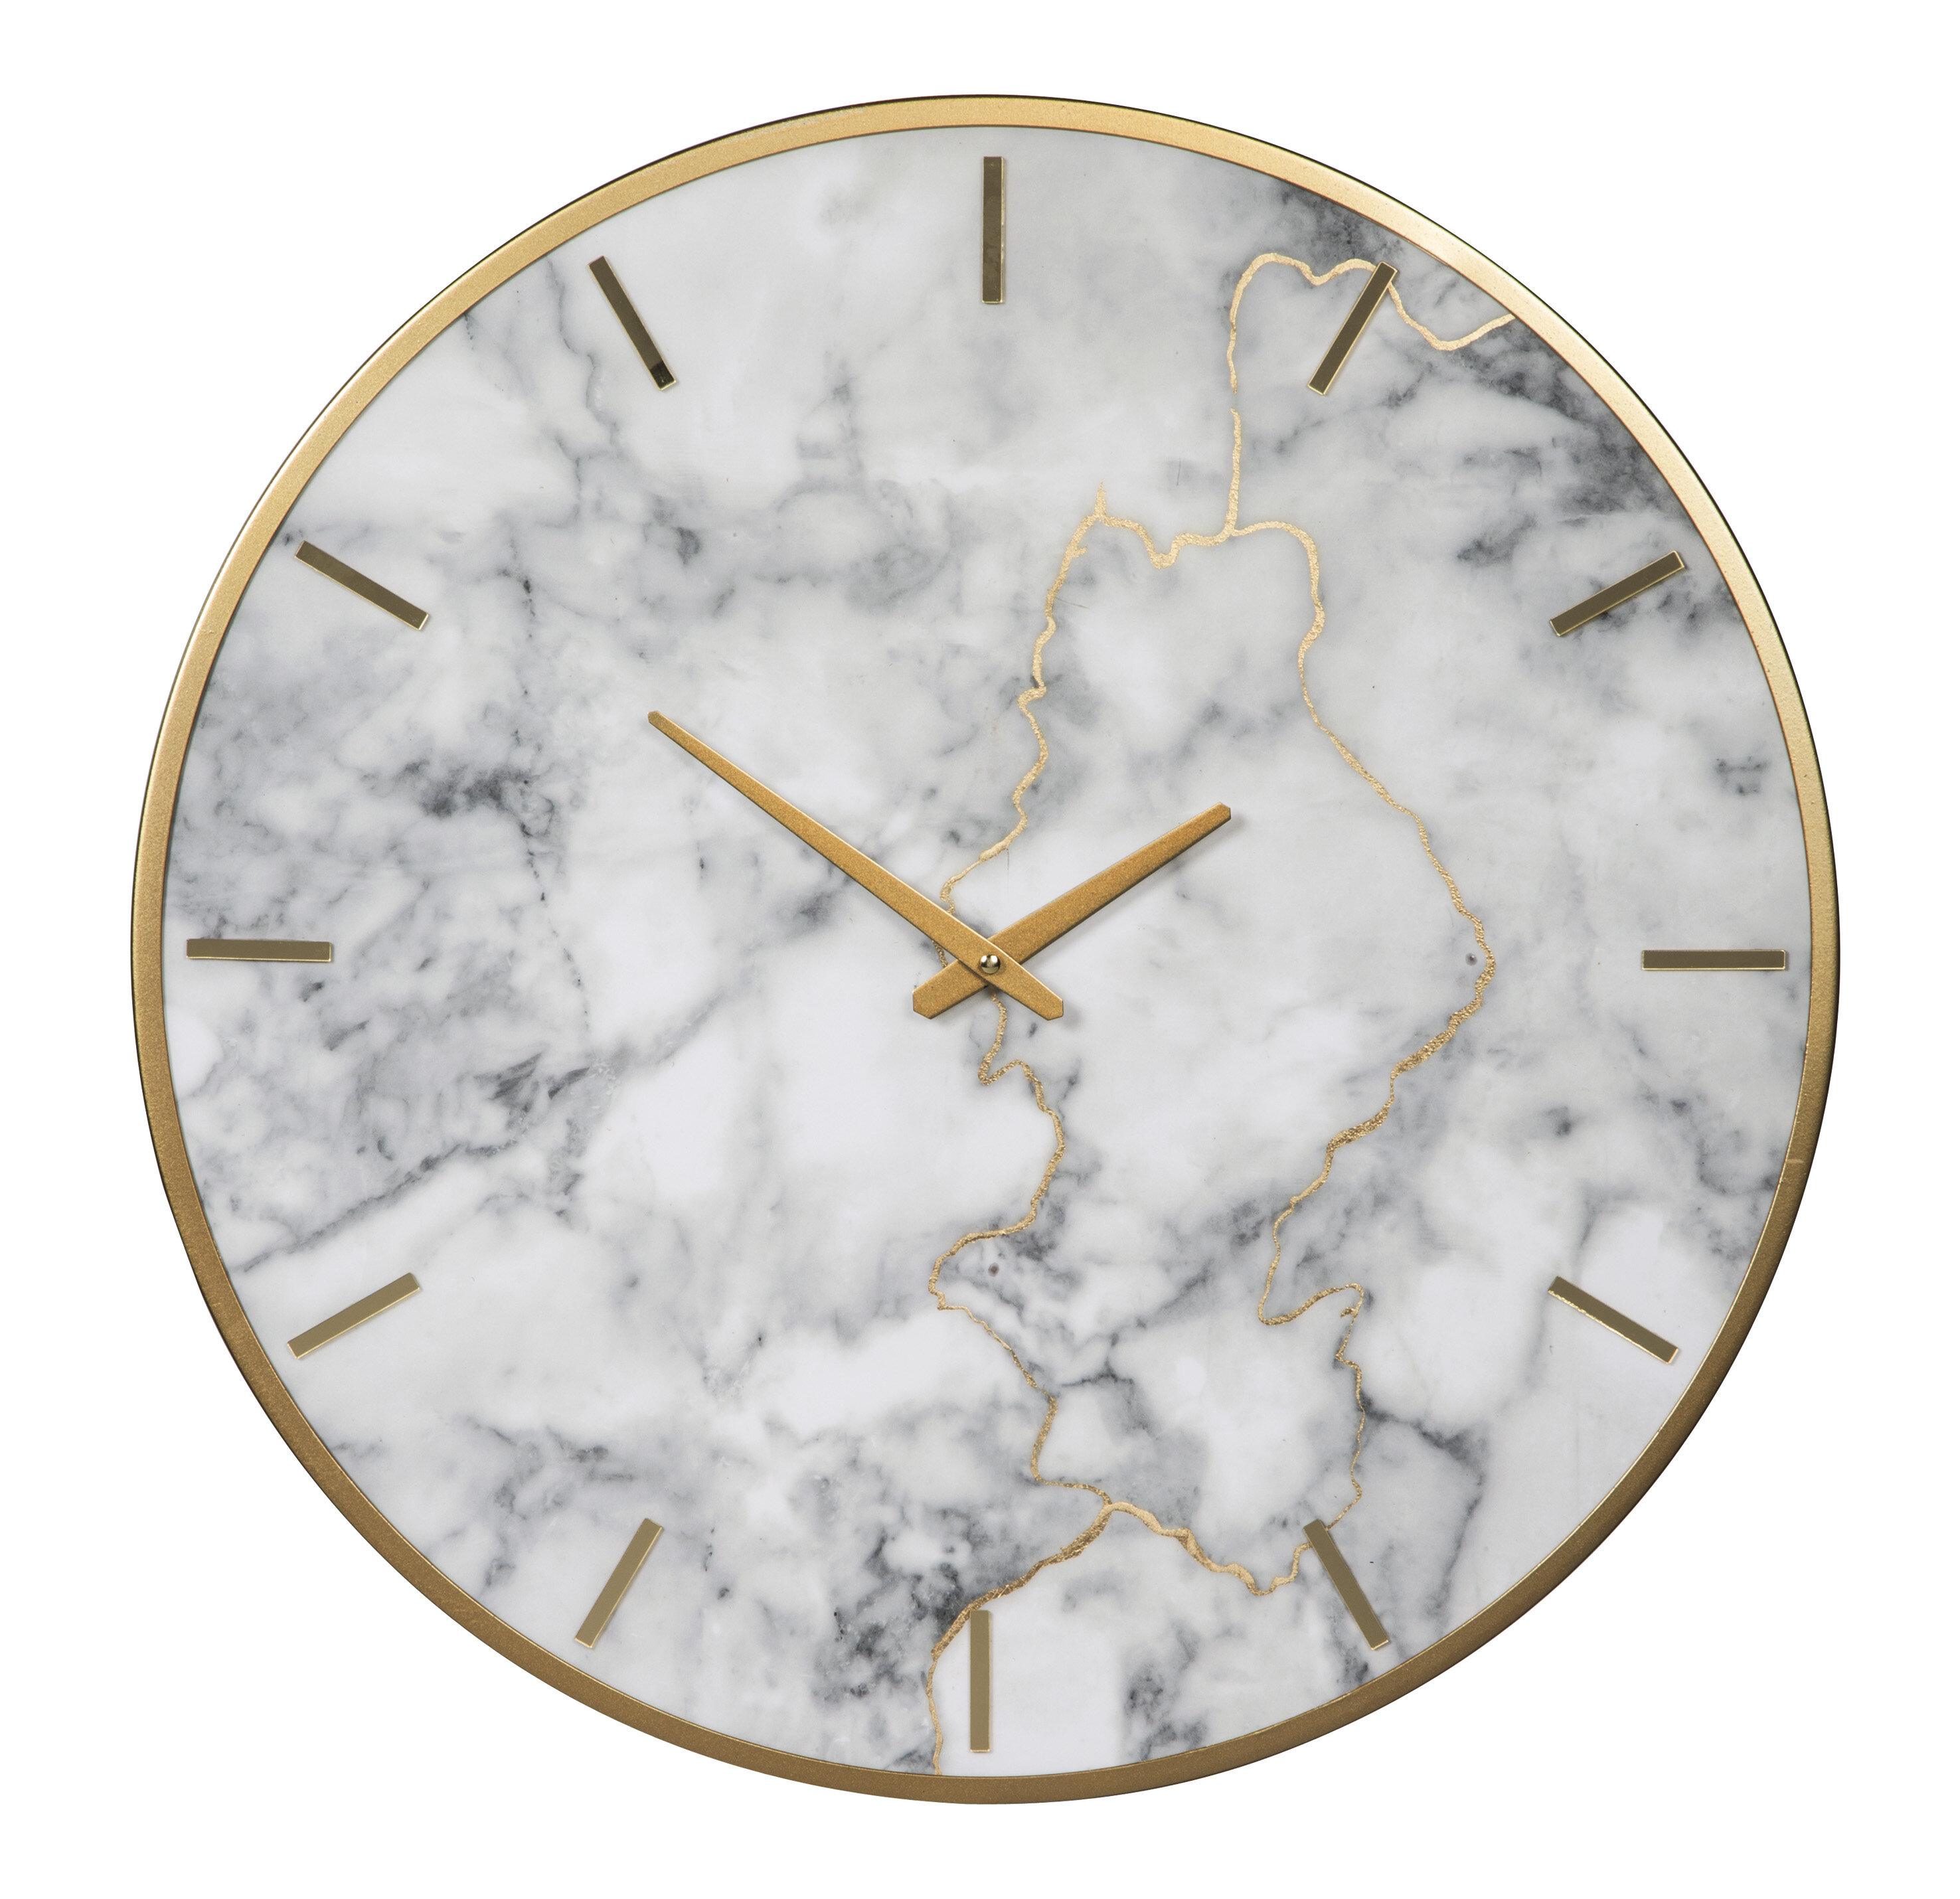 Oversized Wendel 23 6 Wall Clock Reviews Allmodern